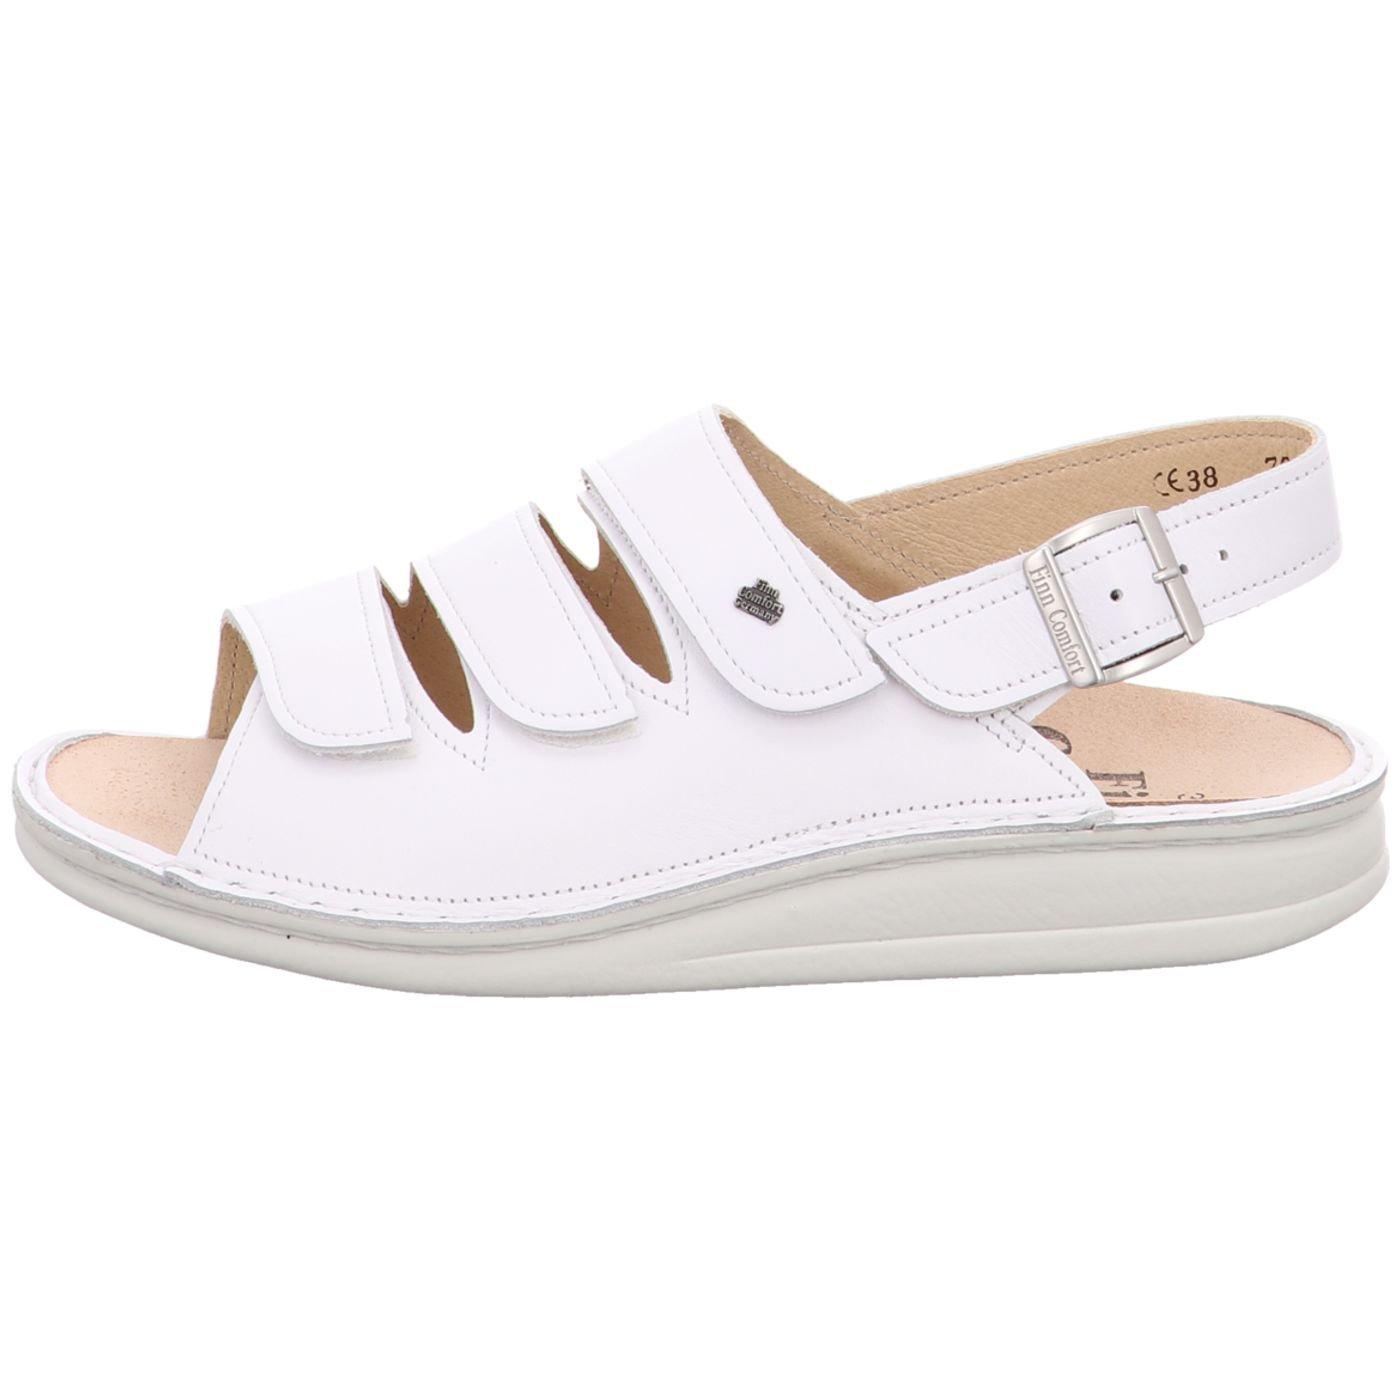 FinnComfort Damen Sandaletten Sylt 2509 001000 weiß 409118